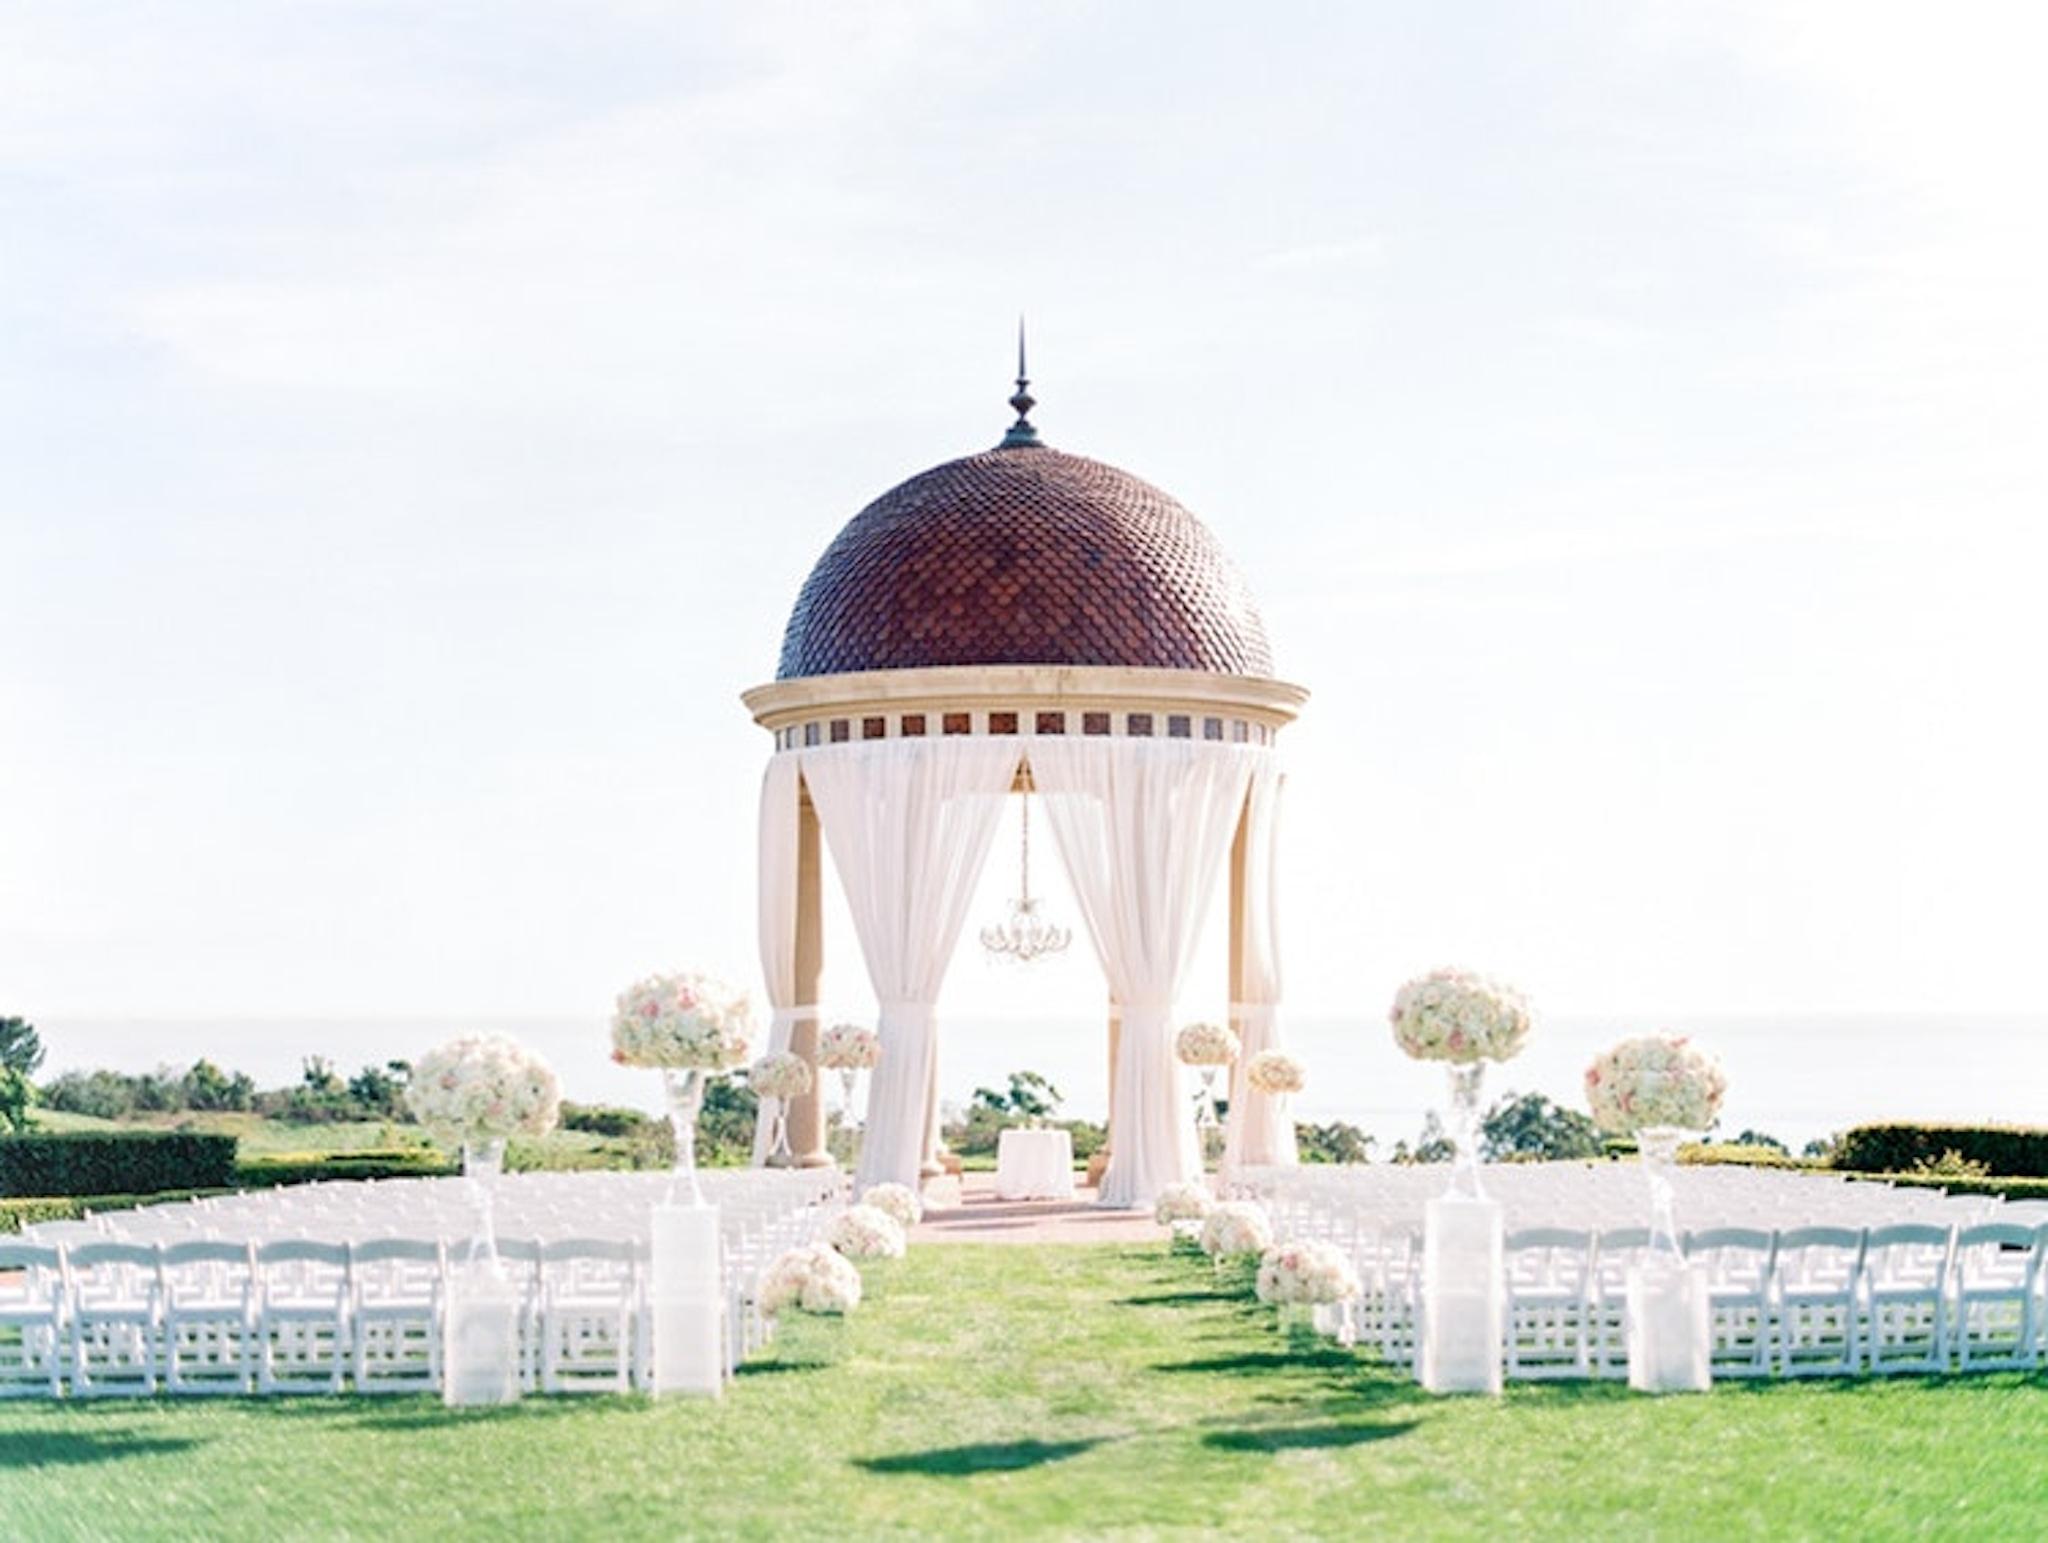 Outdoor wedding venue at The Resort At Pelican Hill